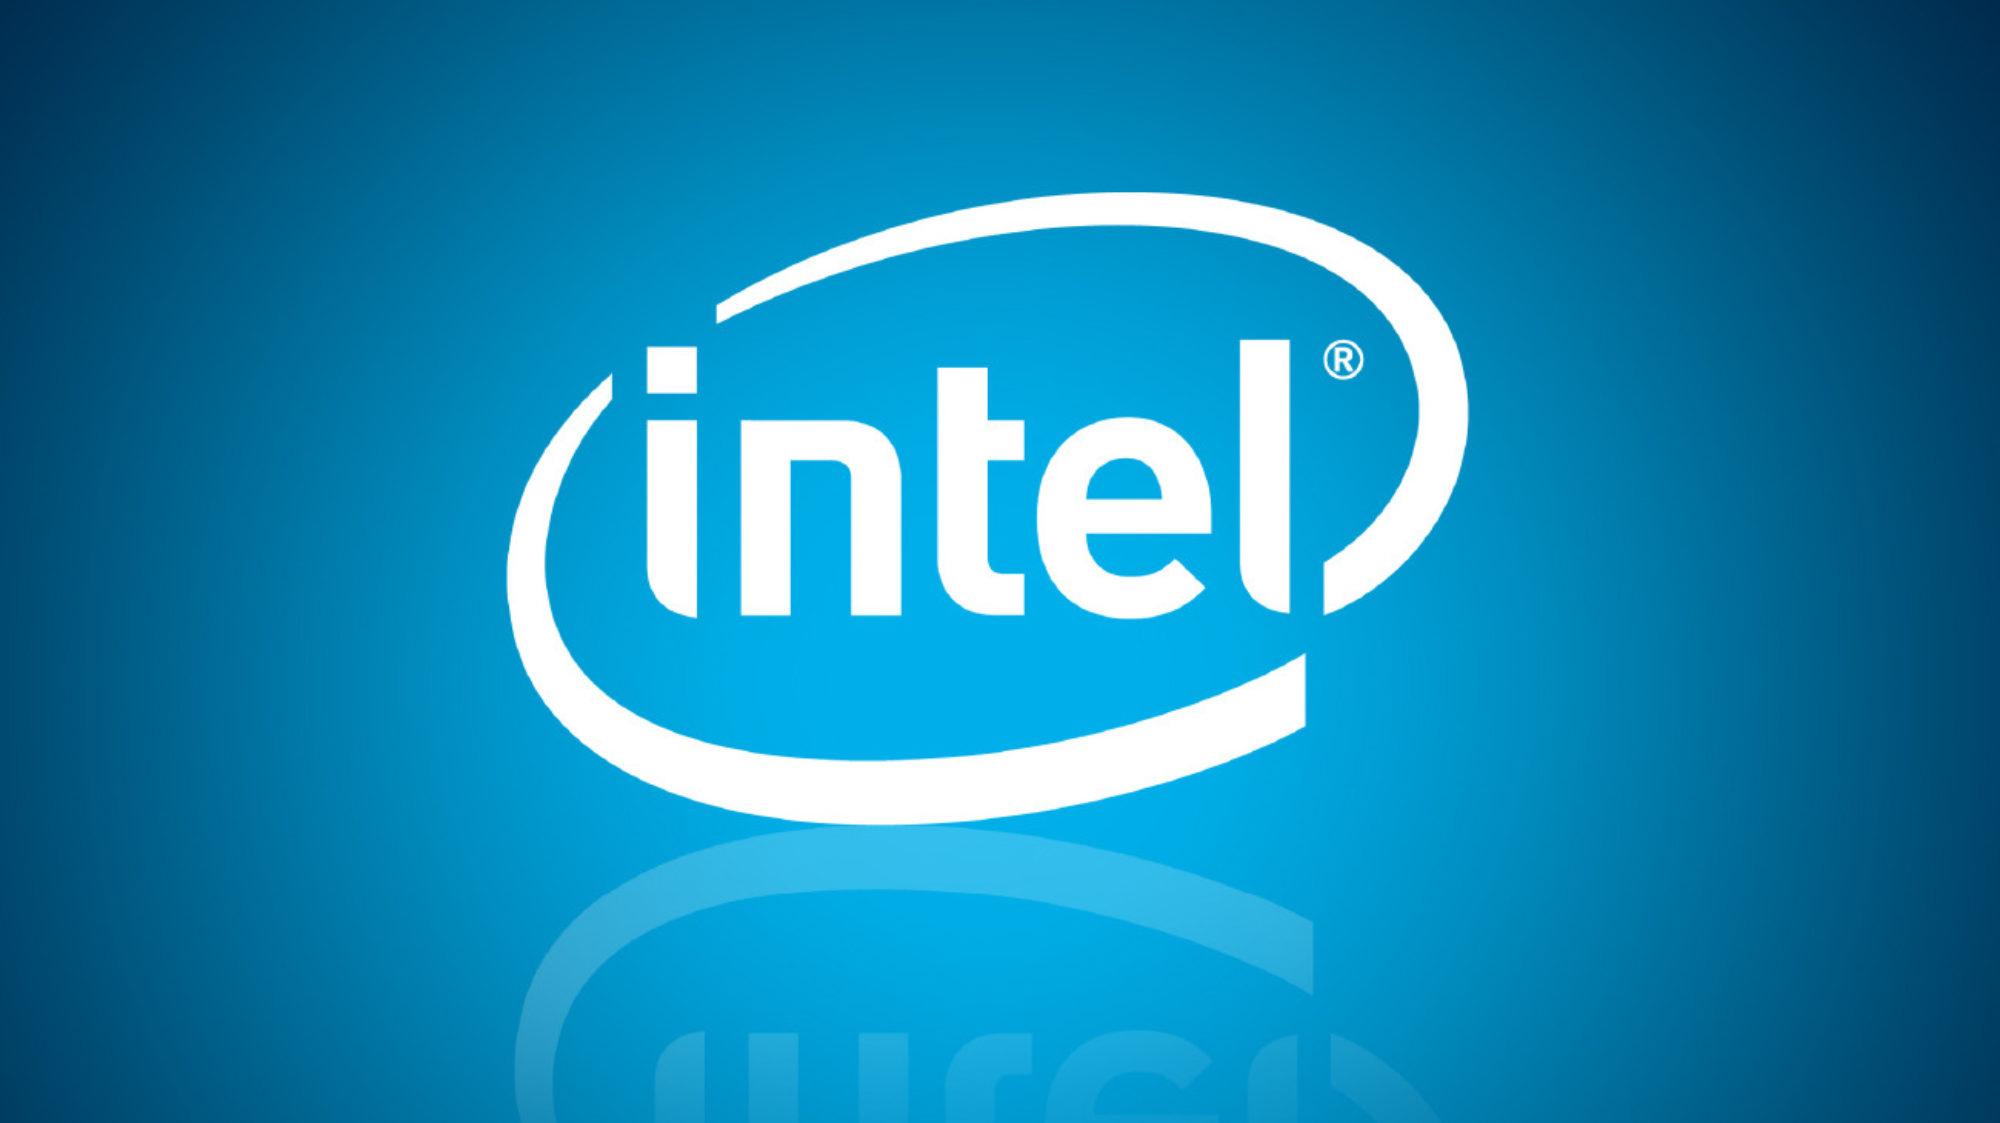 intel inside case study Usage guidelines for the intel inside® trademark approved nouns: brand logo mark name online network program showcase logo symbol.